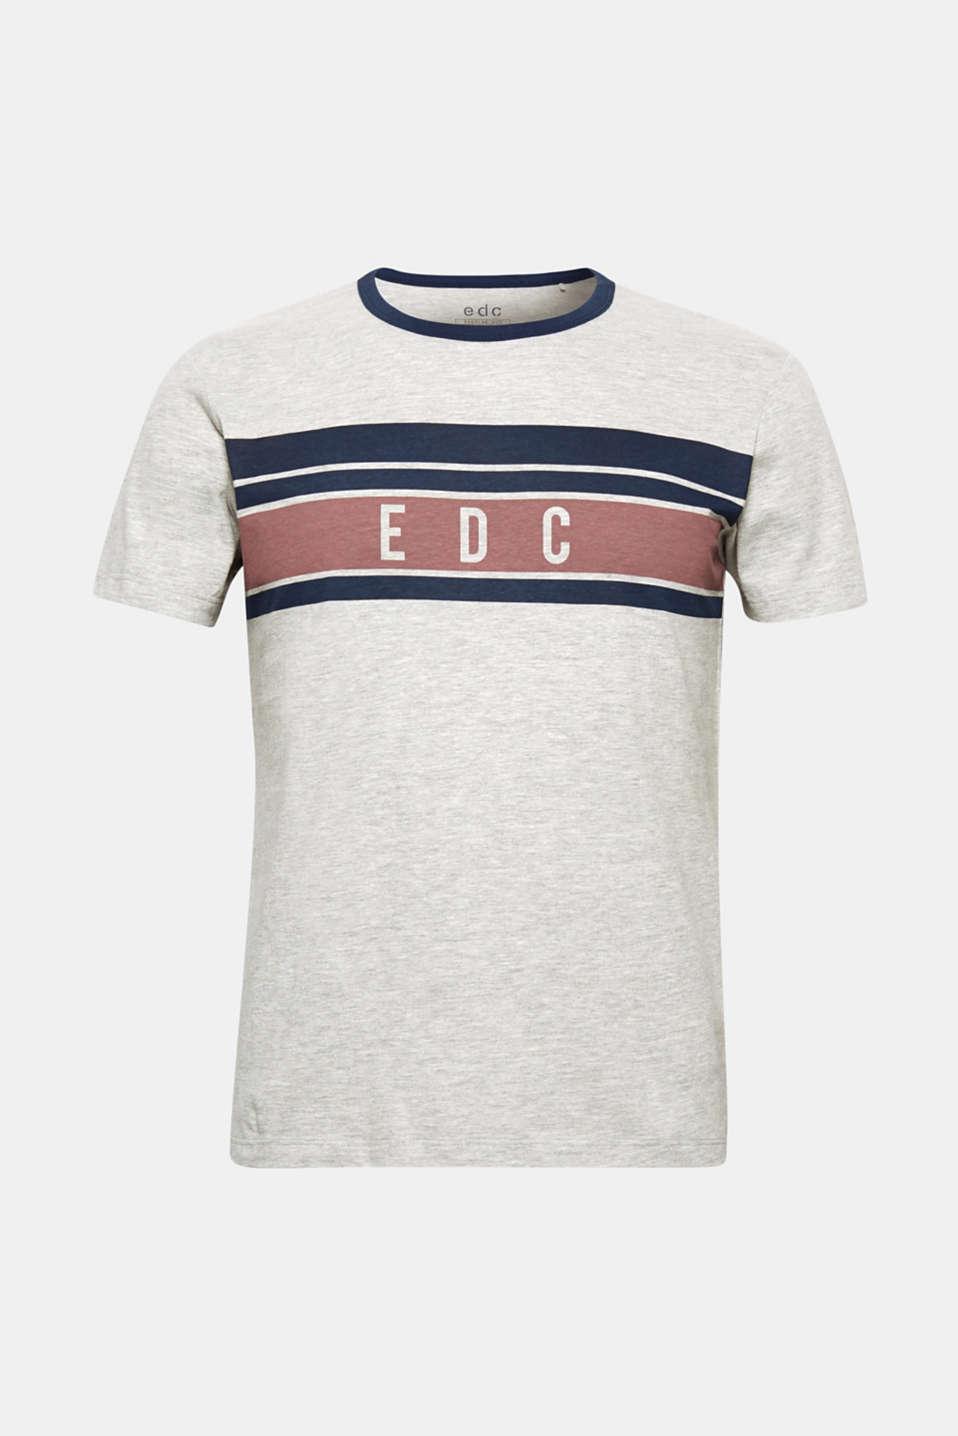 T-Shirts, LIGHT GREY, detail image number 7